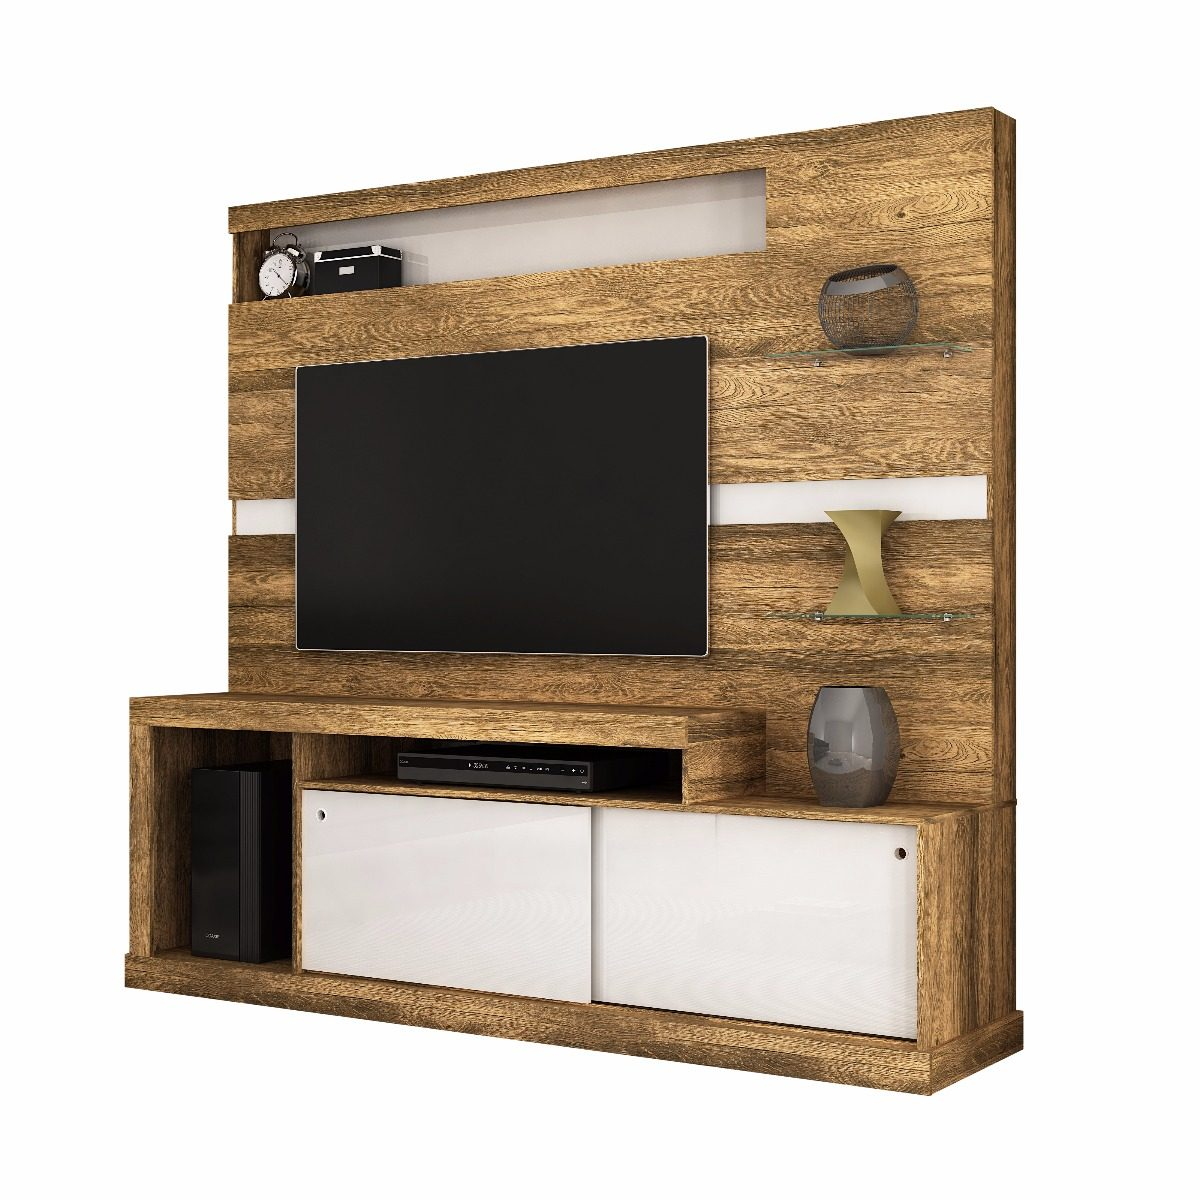 Rack Tv Home Porto Canela Rustico Branco Mueble 109 990  # Muebles Rack Para Tv